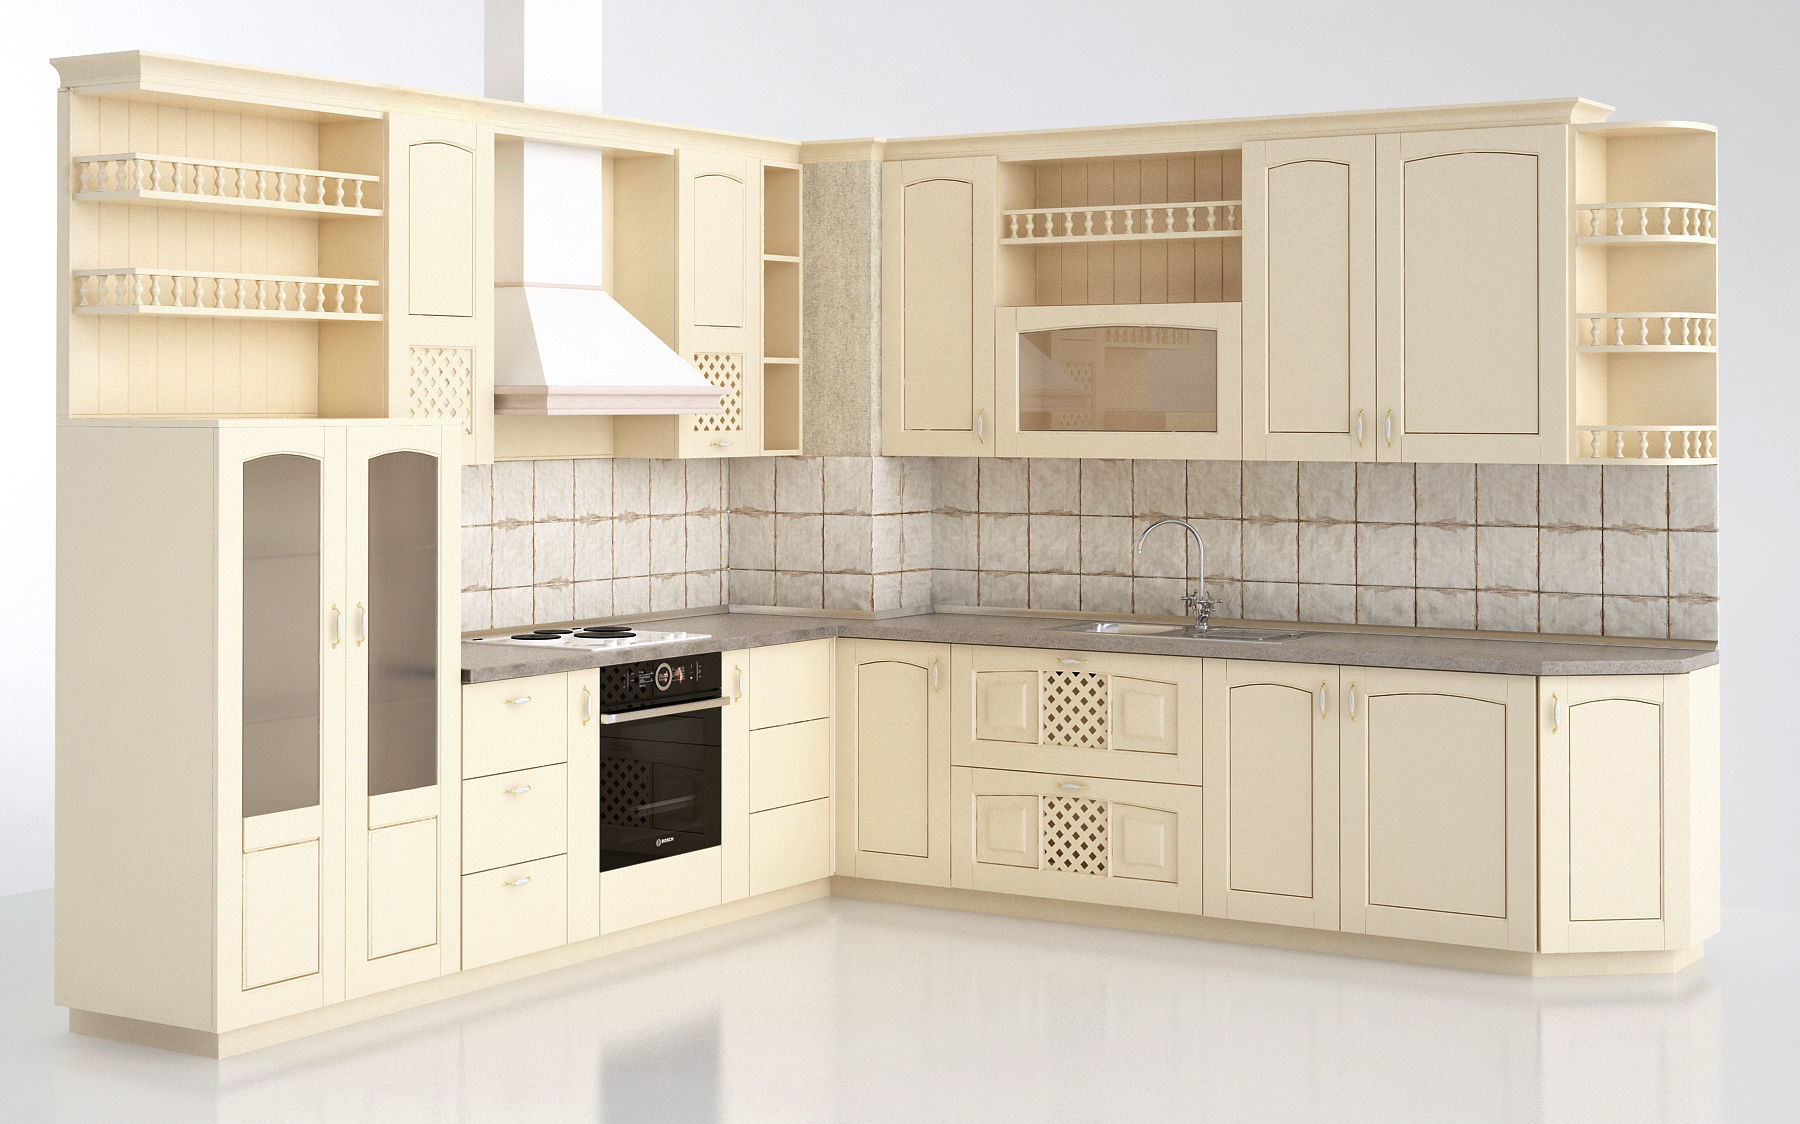 ginevra vaniglia kitchen Cucine classiche | 3D model